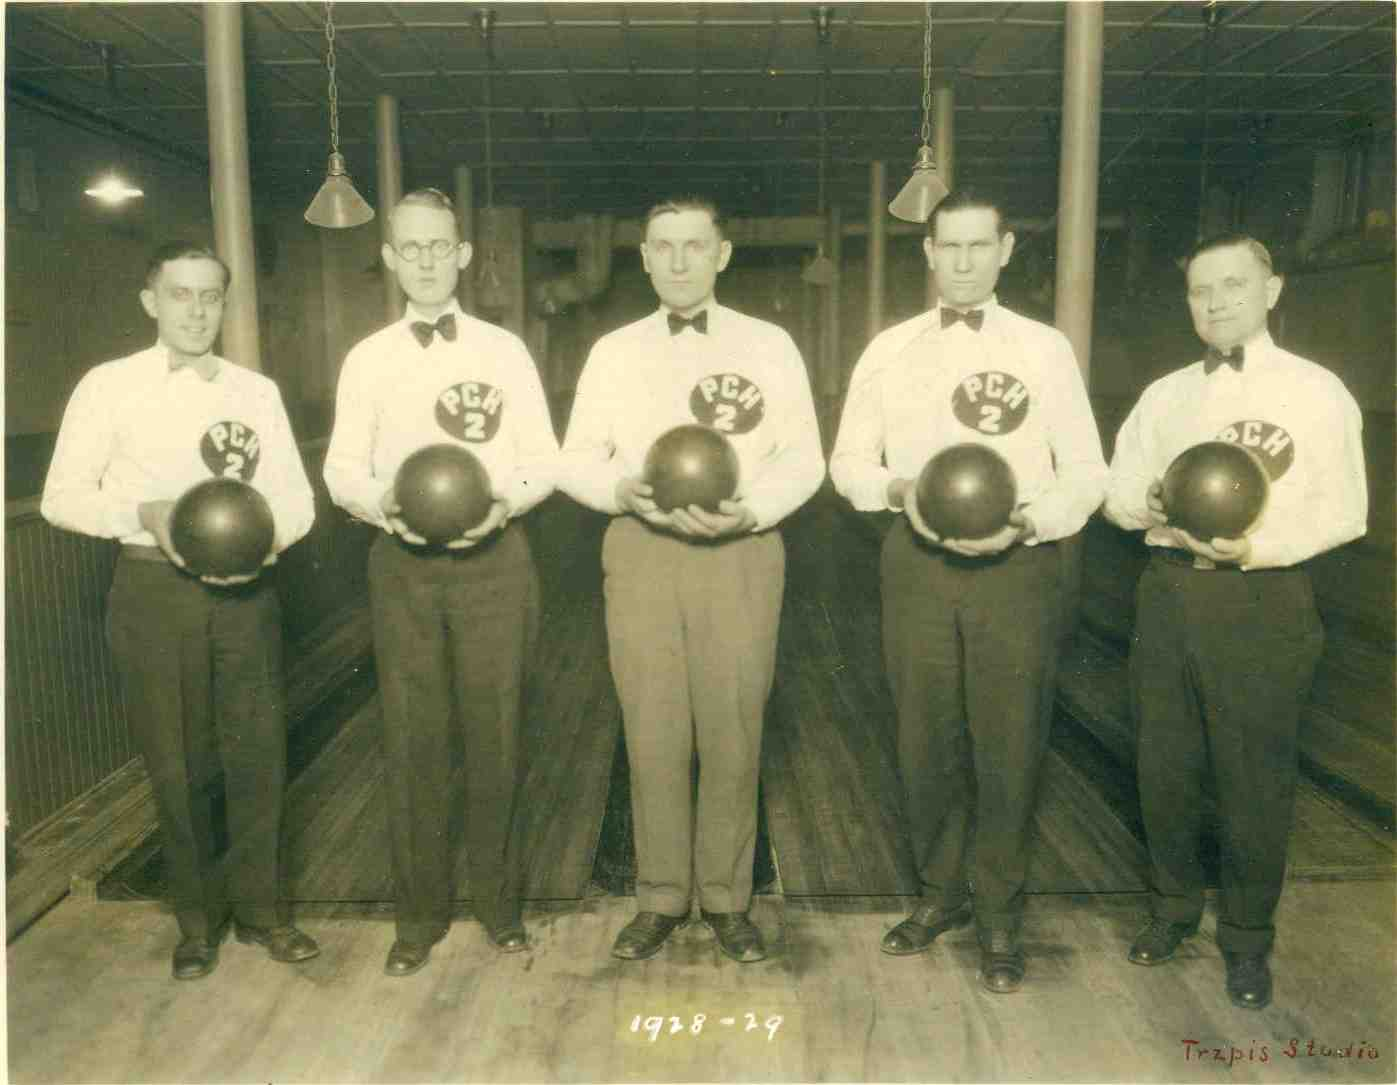 1928 Polish Home Bowlers